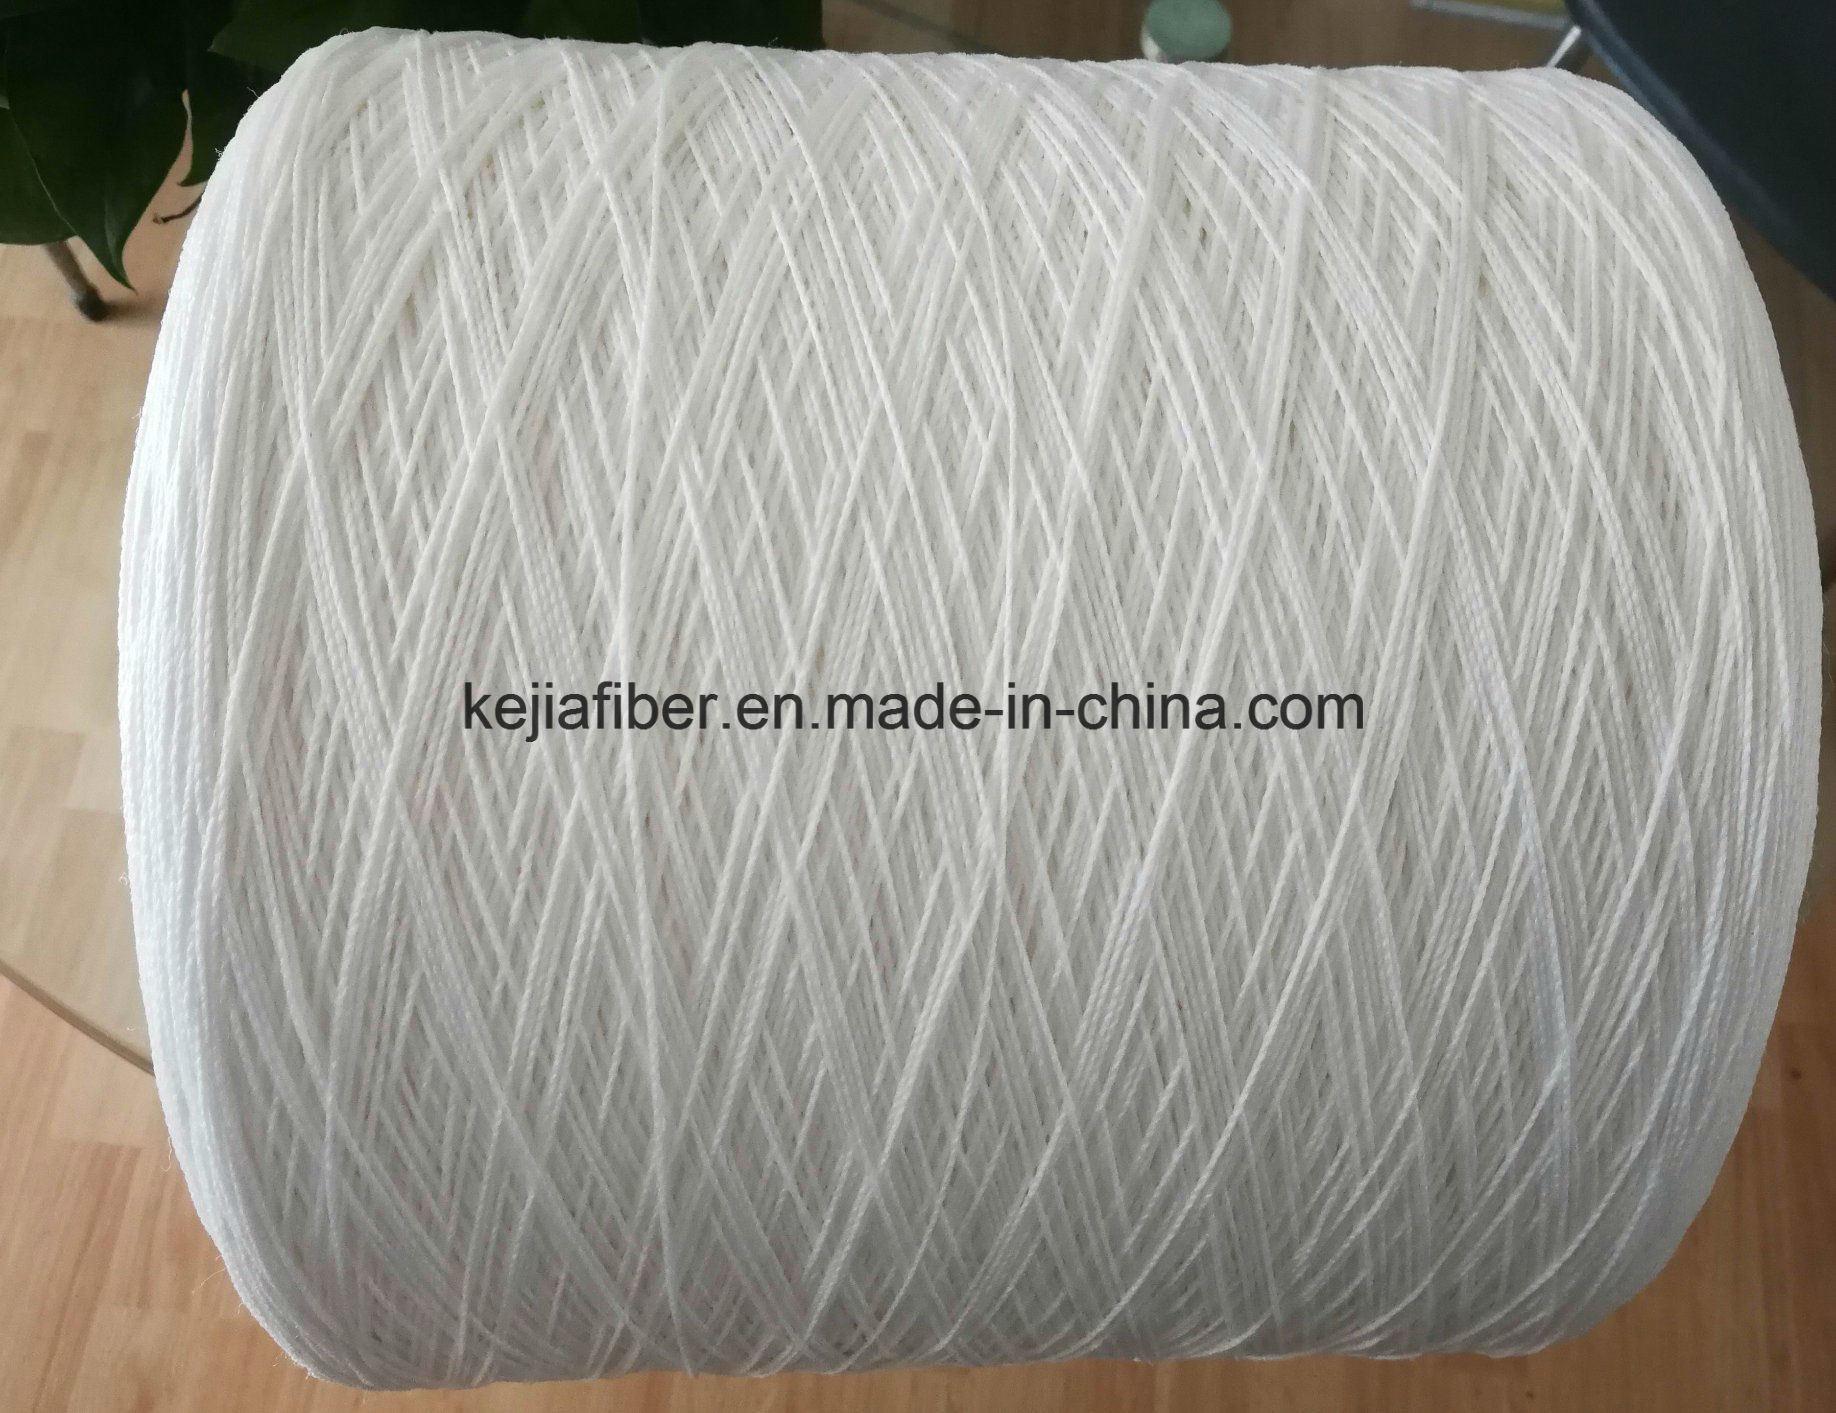 China Bcf Carpet Yarn, Bcf Carpet Yarn Manufacturers, Suppliers | Made-in-China.com